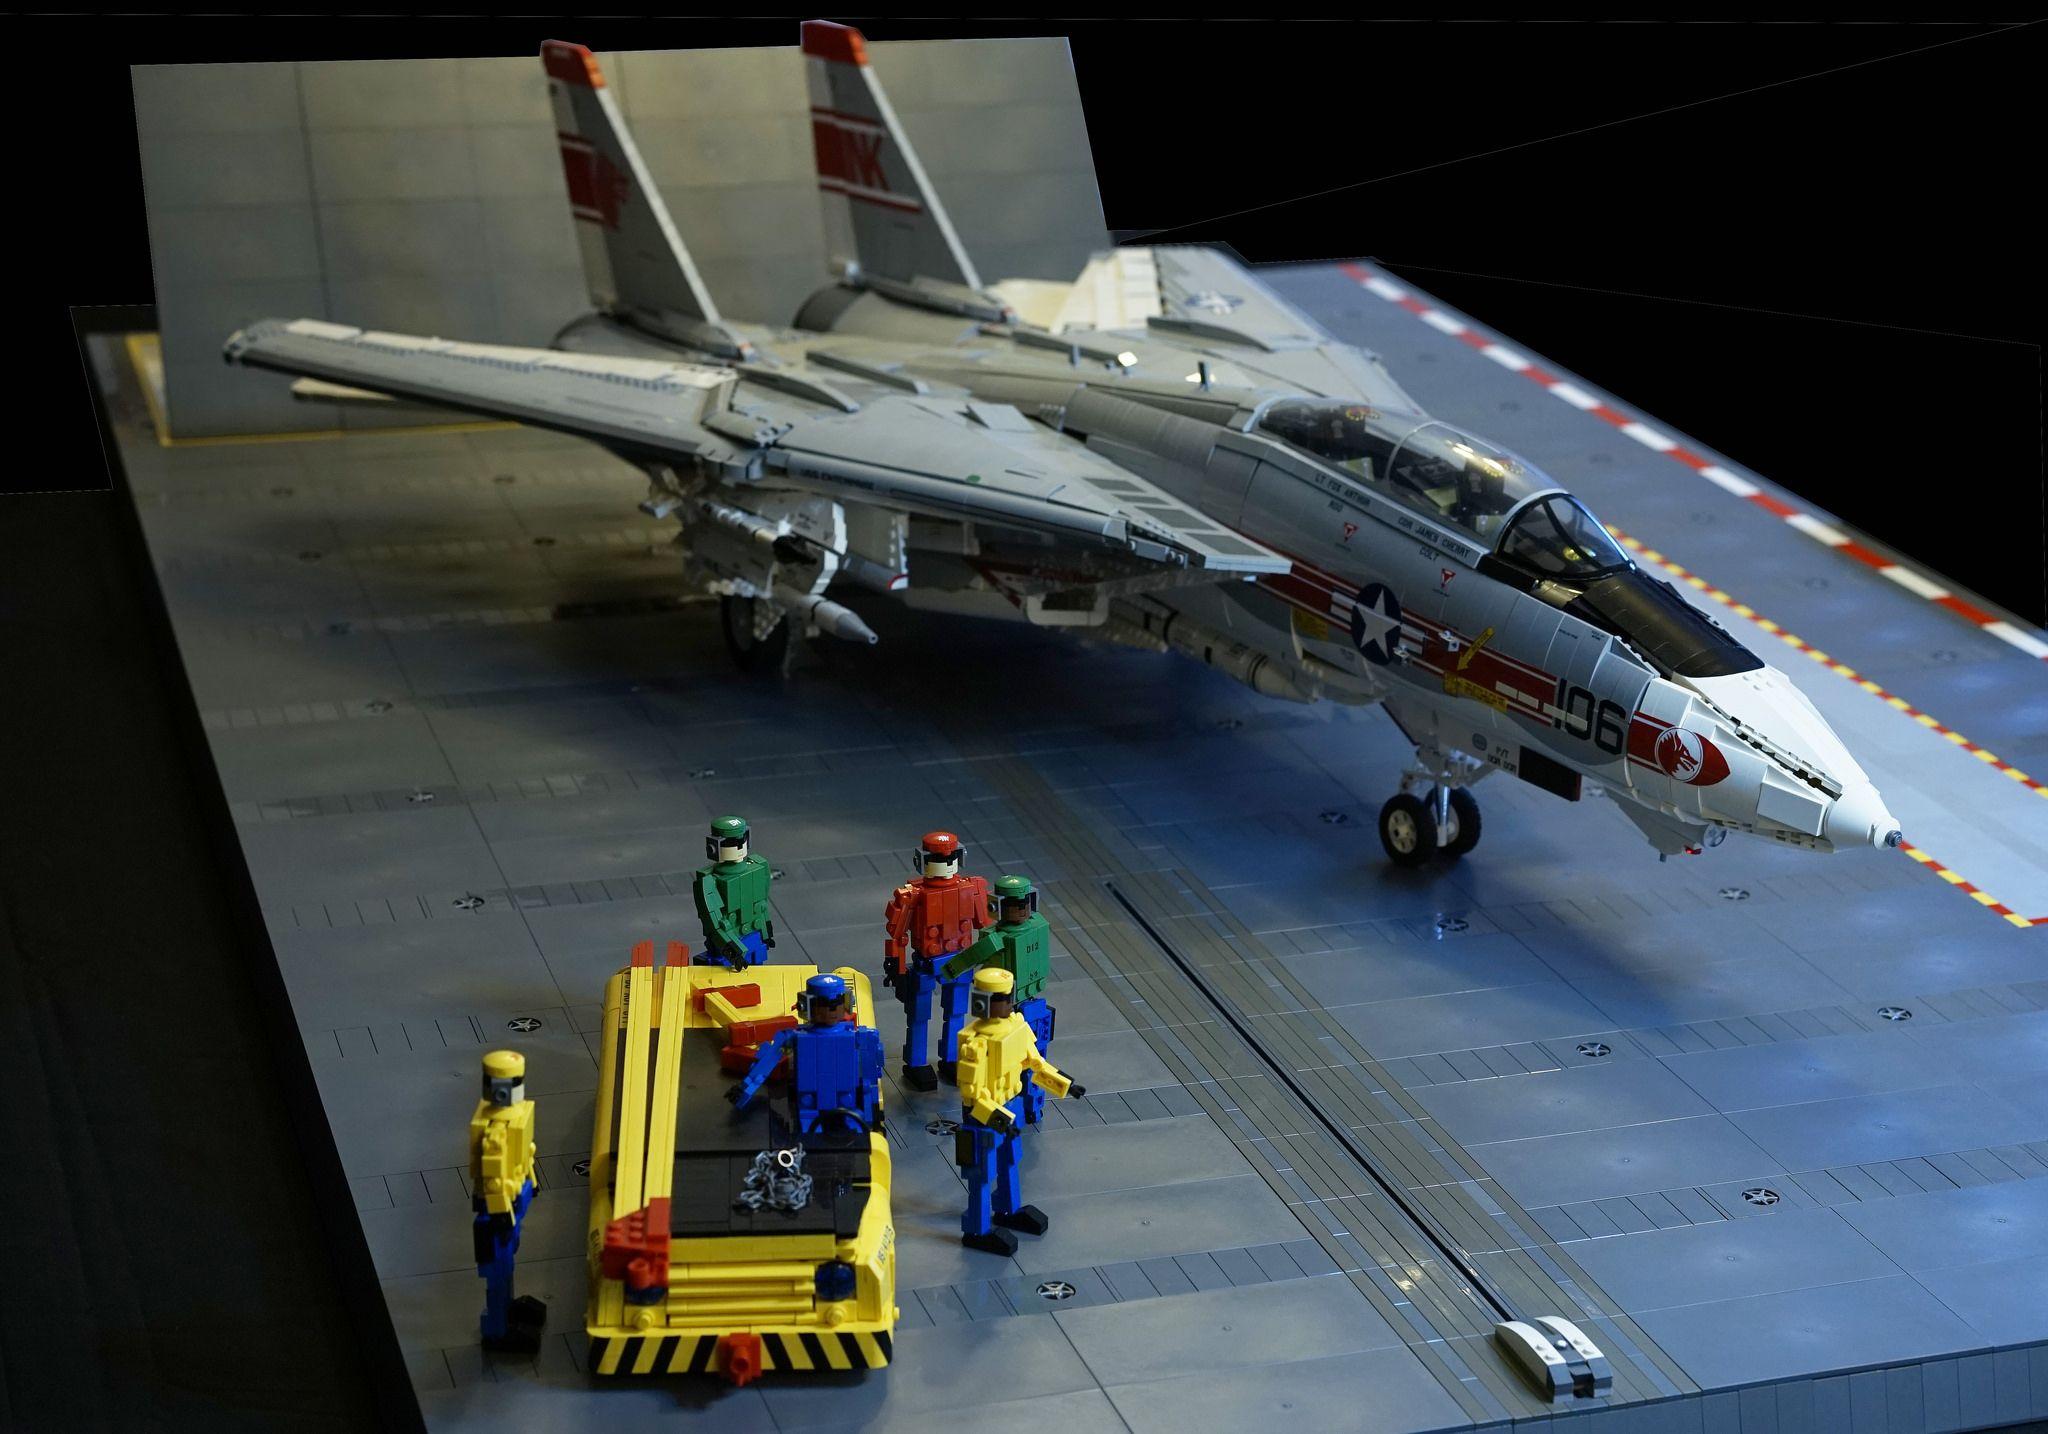 F,14A Tomcat \u0026 Deck Crew